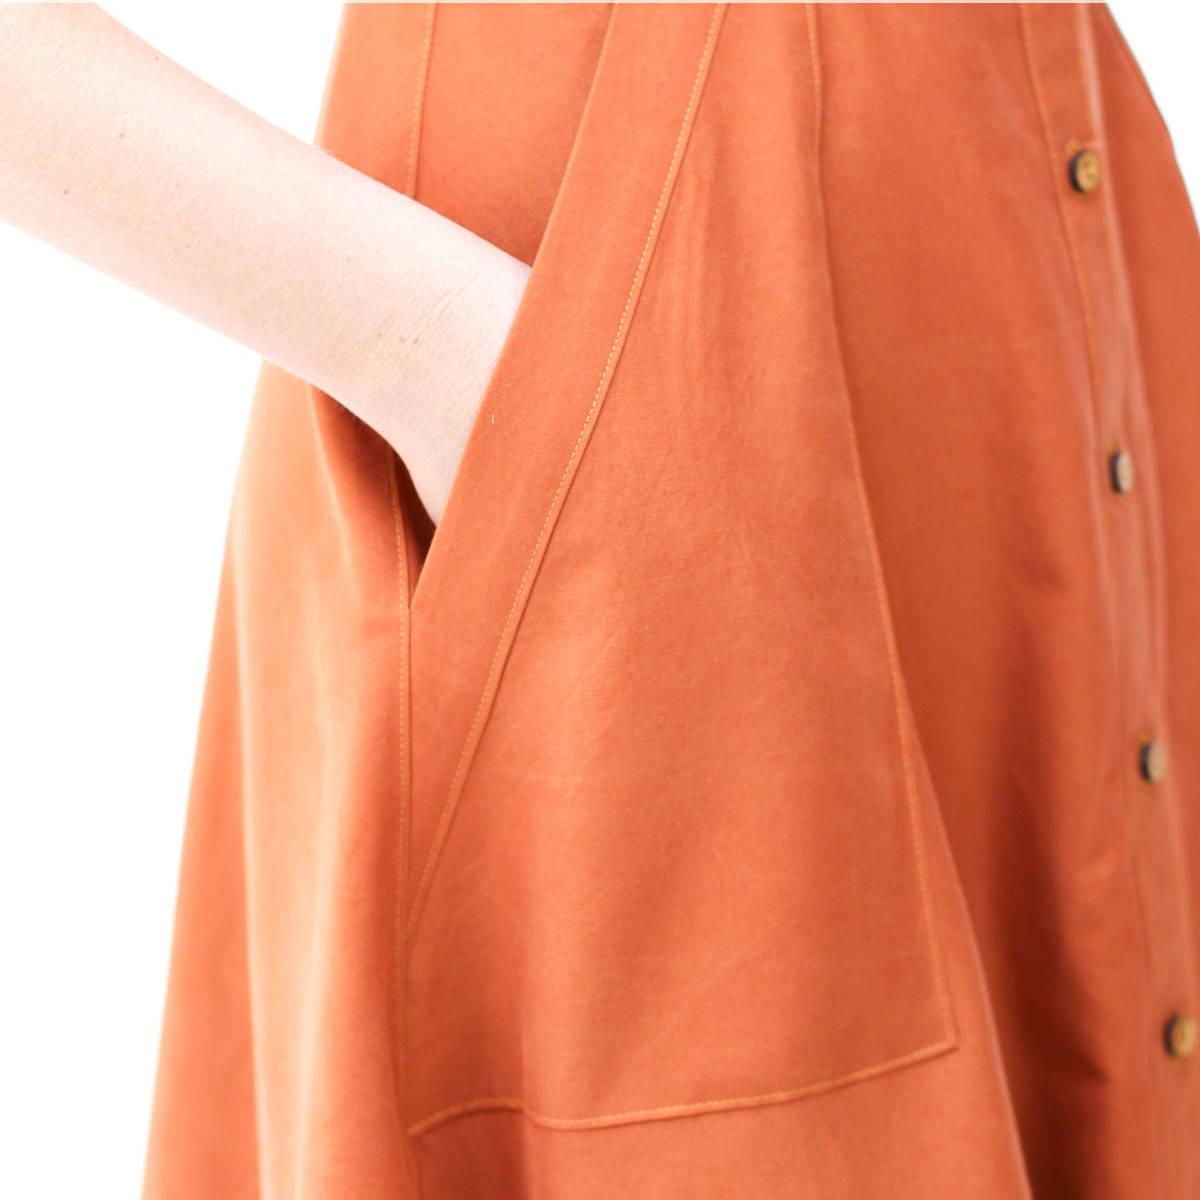 Matilda Skirt & Skirt Pockets